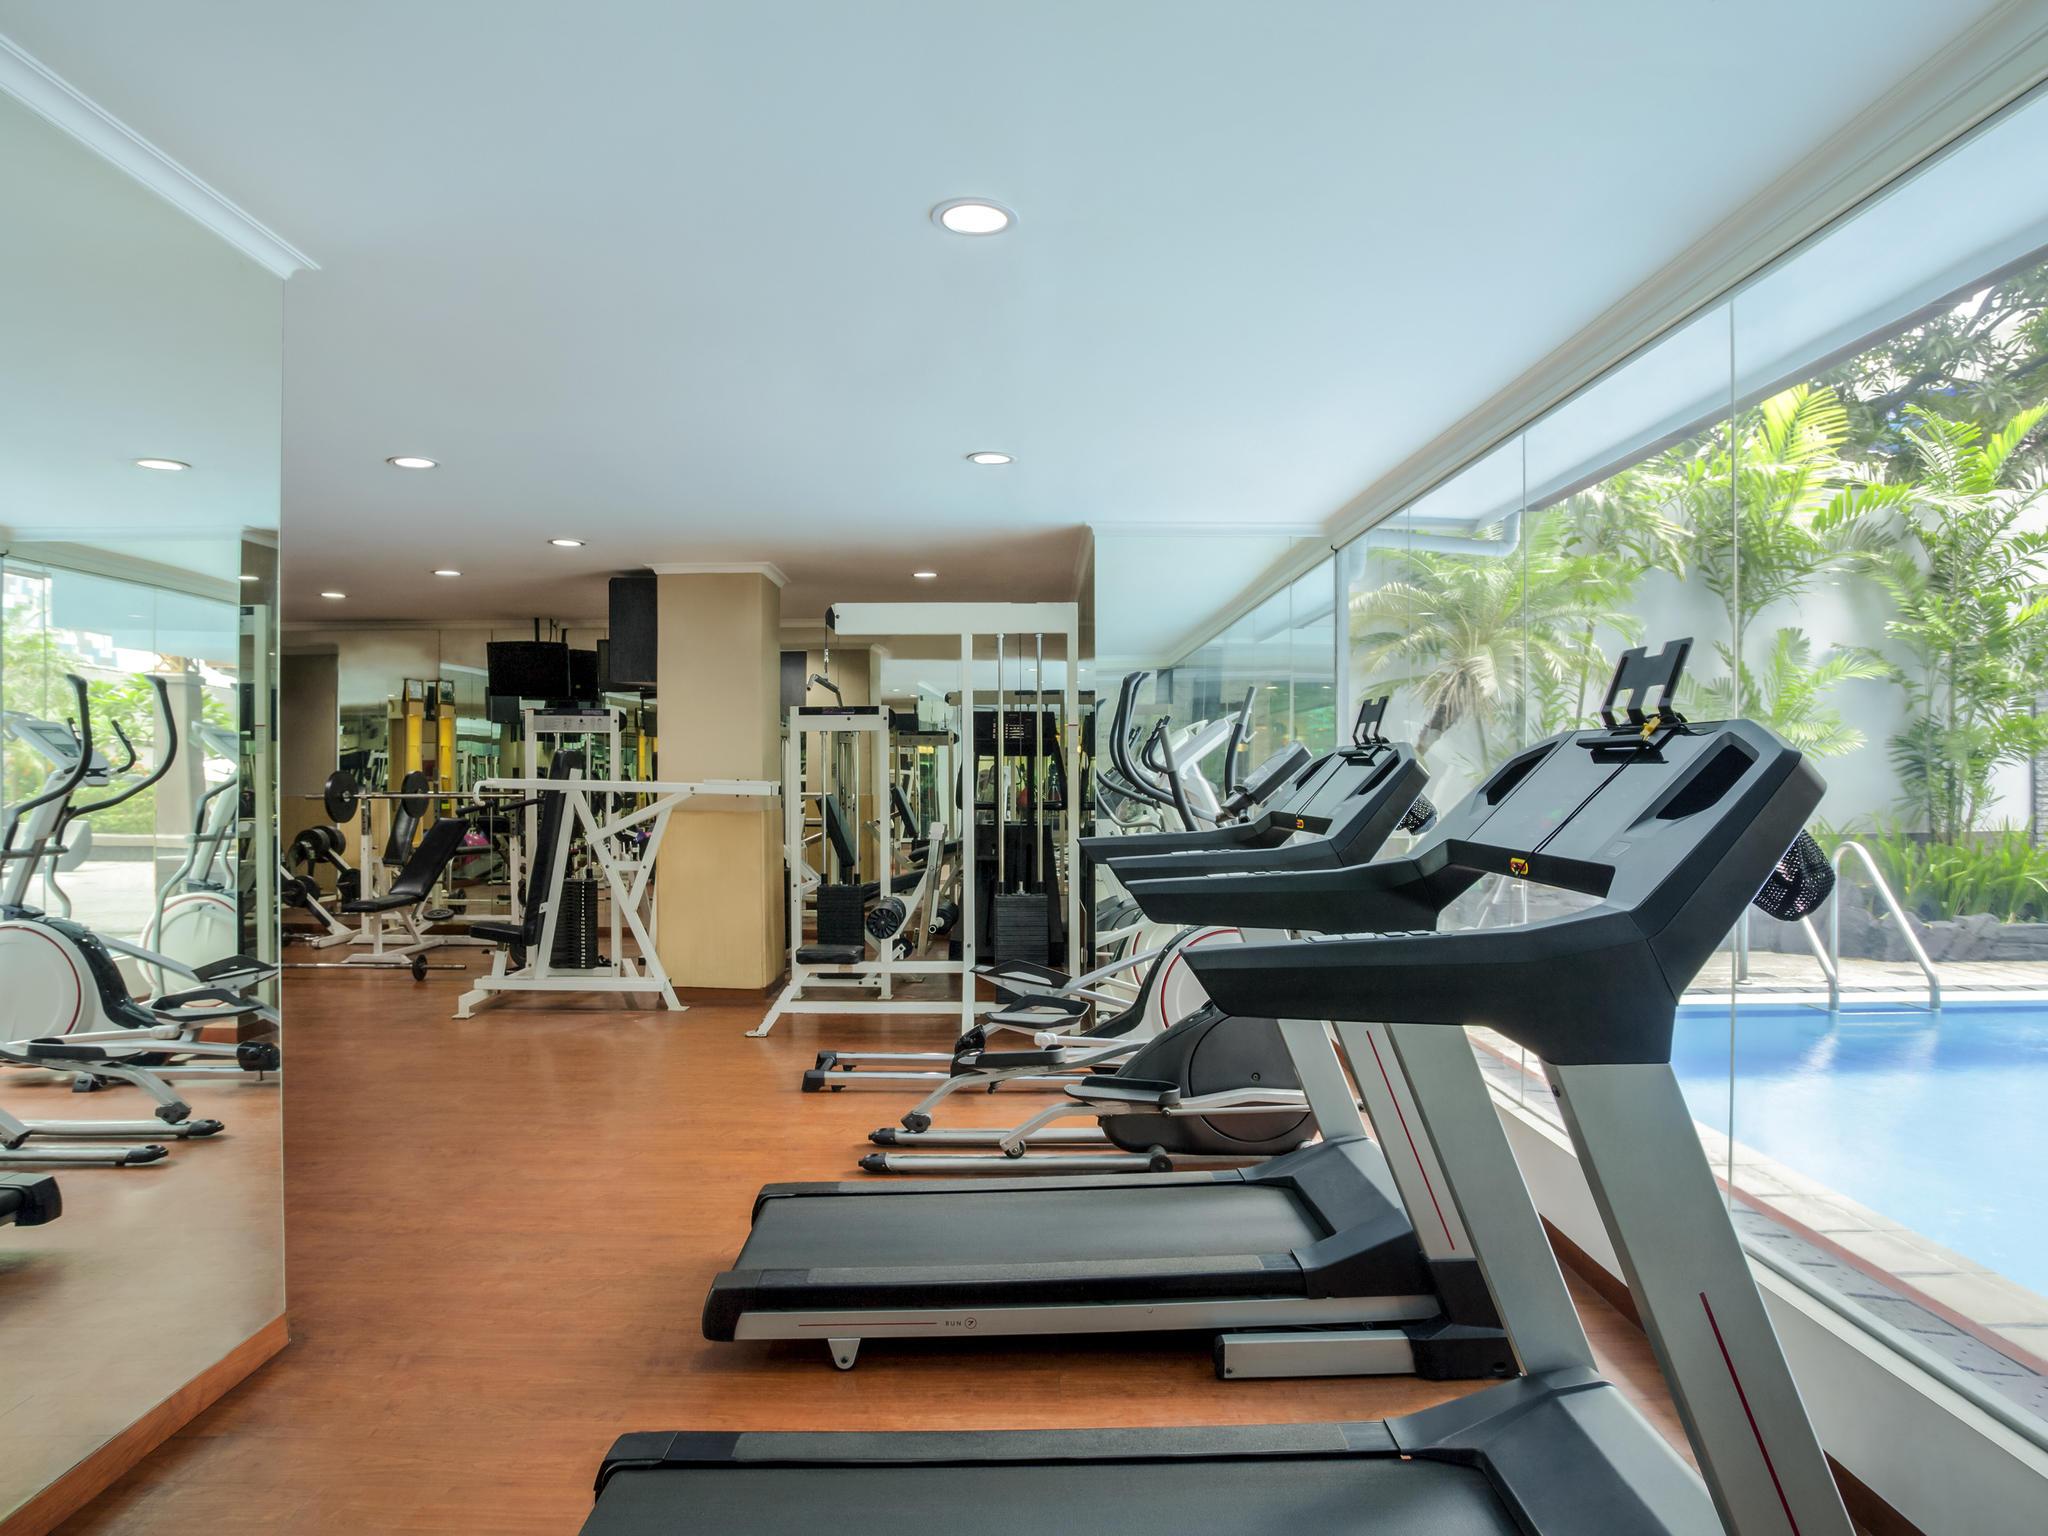 Hotel In Jakarta Thamrin Ibis Tamarin Accorhotels Paket Murmer Acces Point Komplit Services